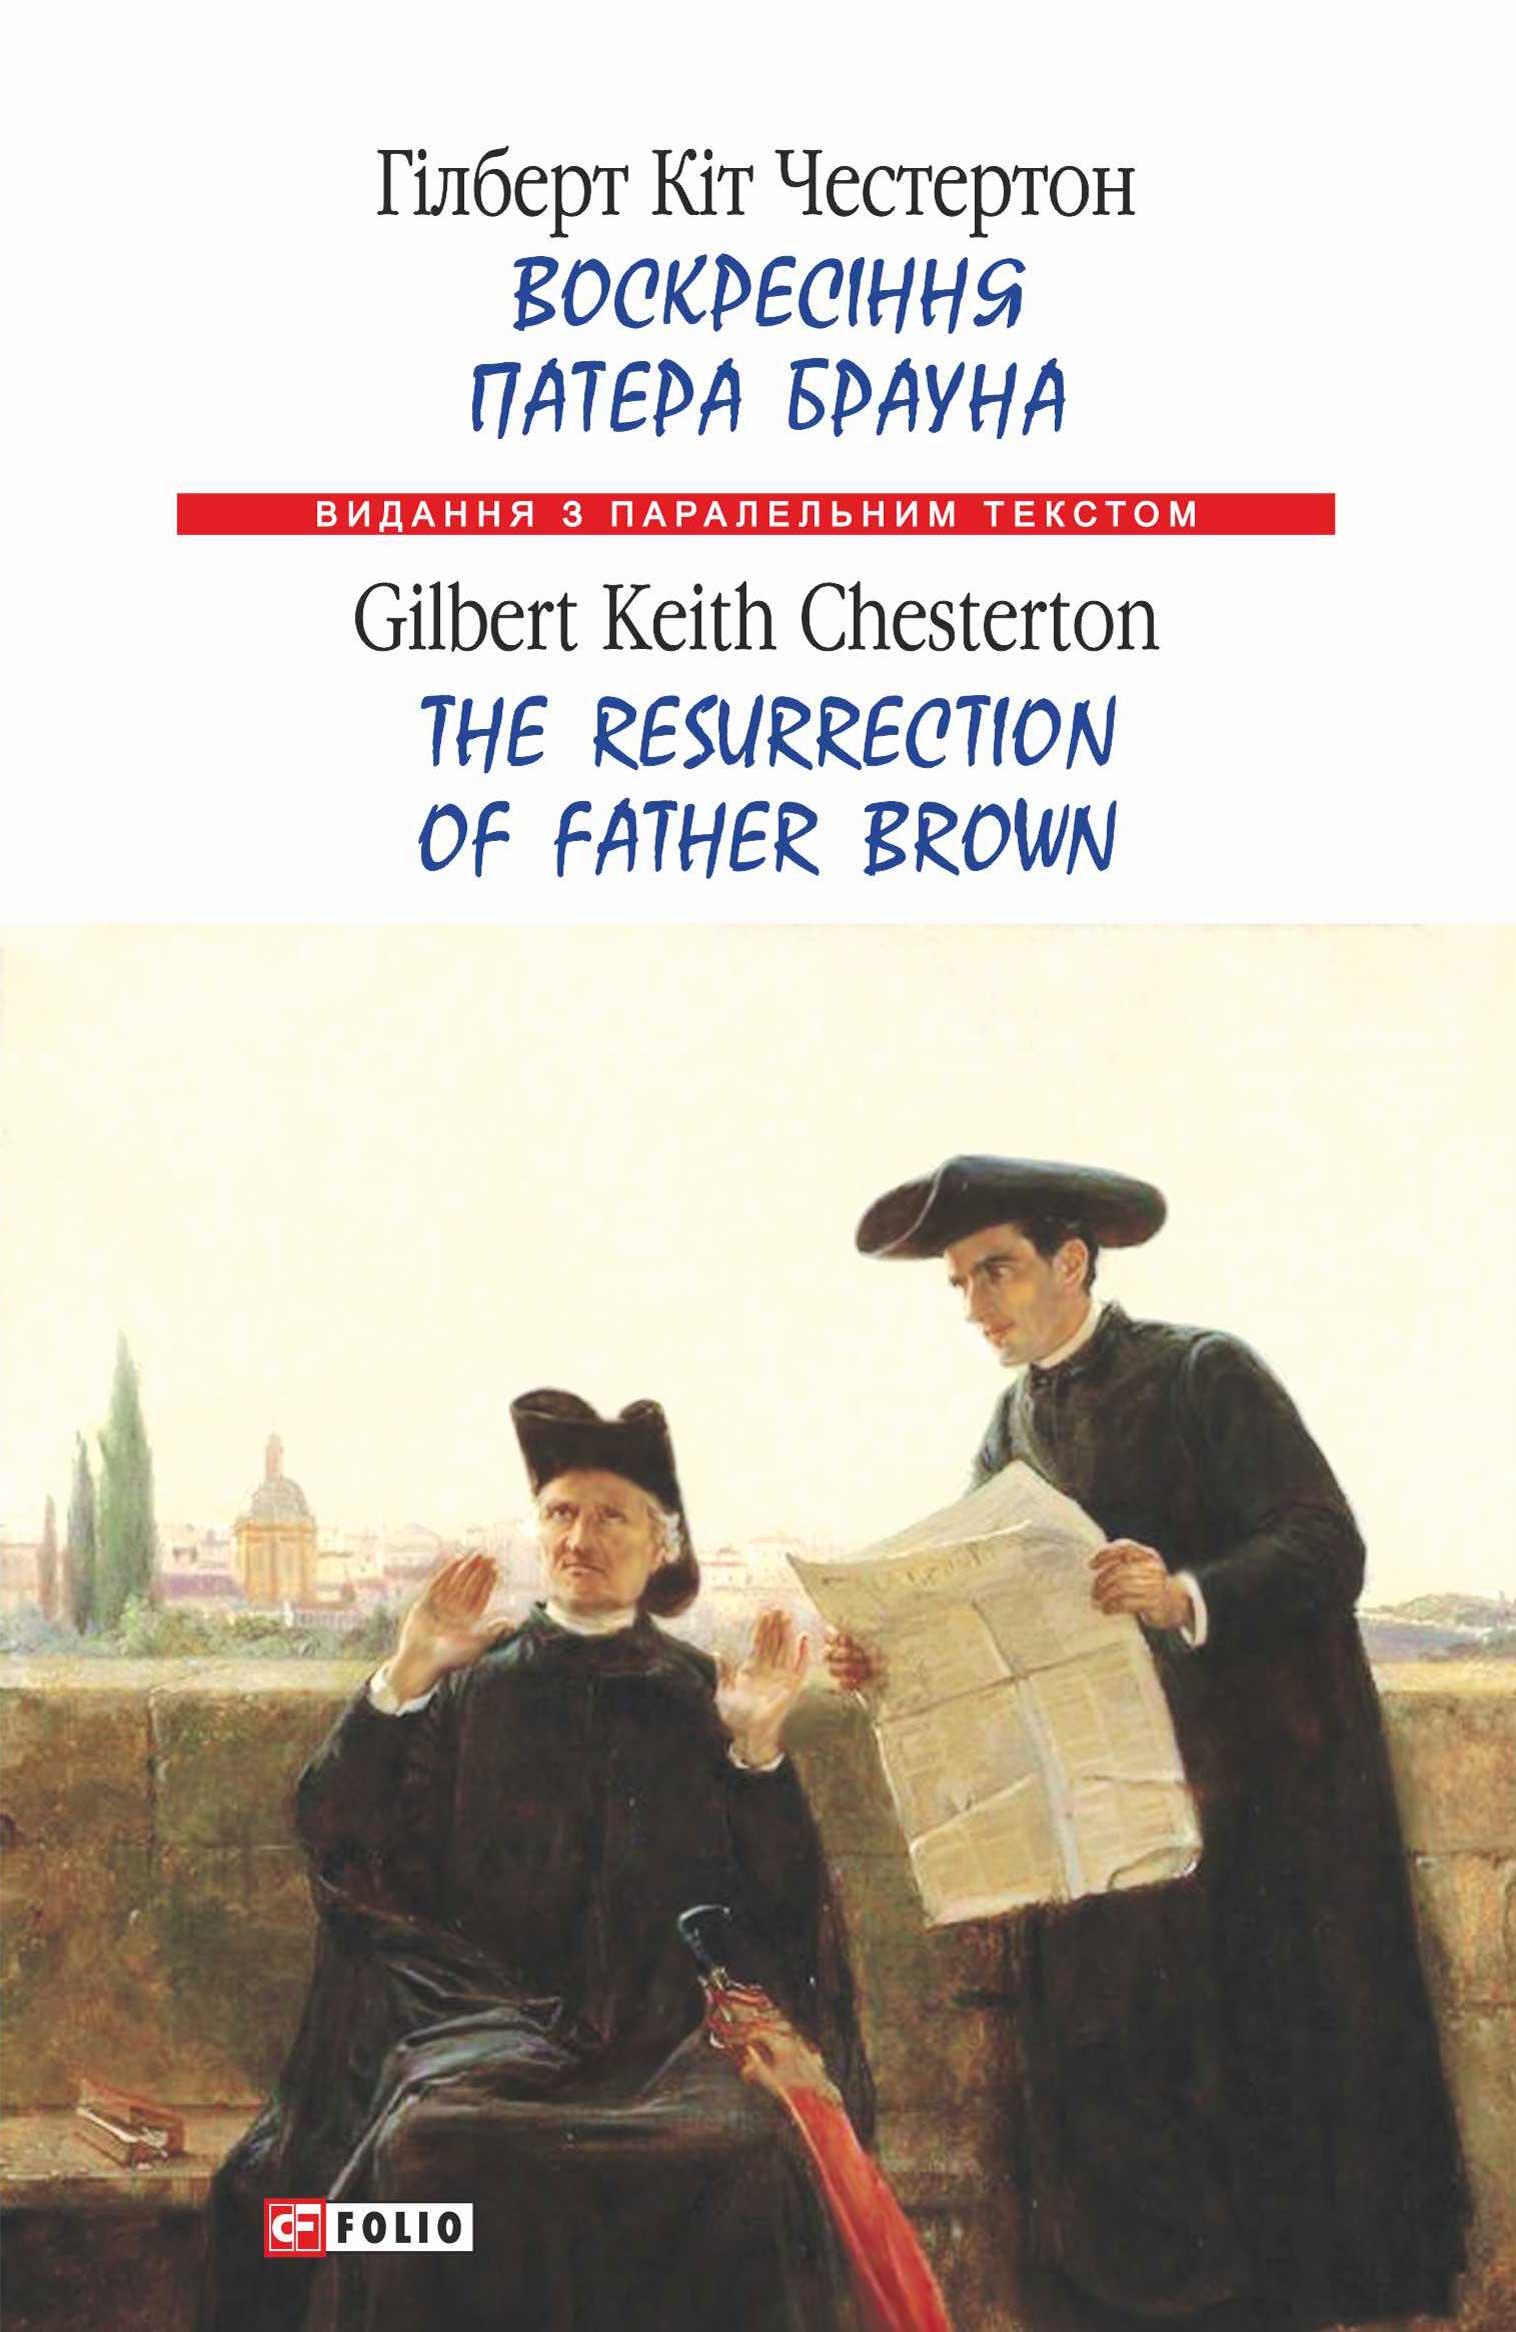 Фото - Гилберт Кит Честертон Воскресіння патера Брауна = The Resurrection of Father Brown гилберт честертон смерть и воскрешение патера брауна сборник